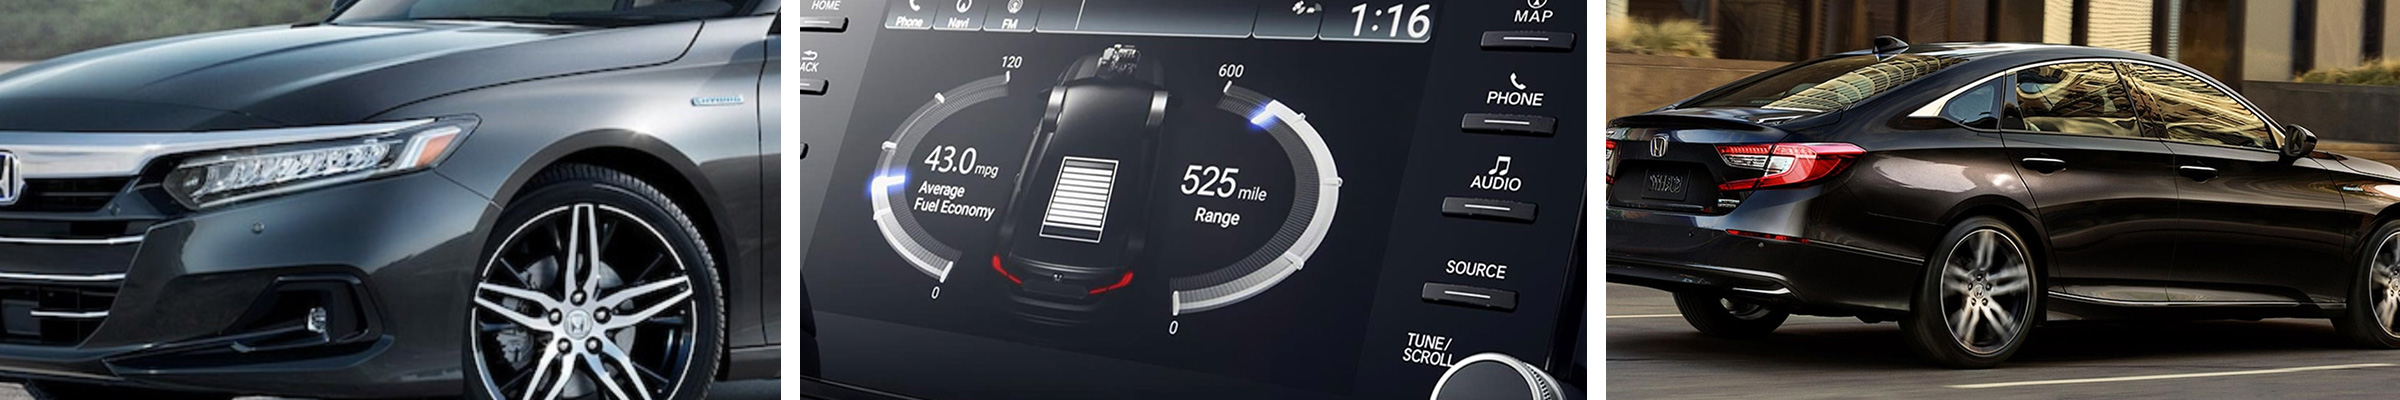 2021 Honda Accord Hybrid For Sale Baton Rouge LA   Denham Springs